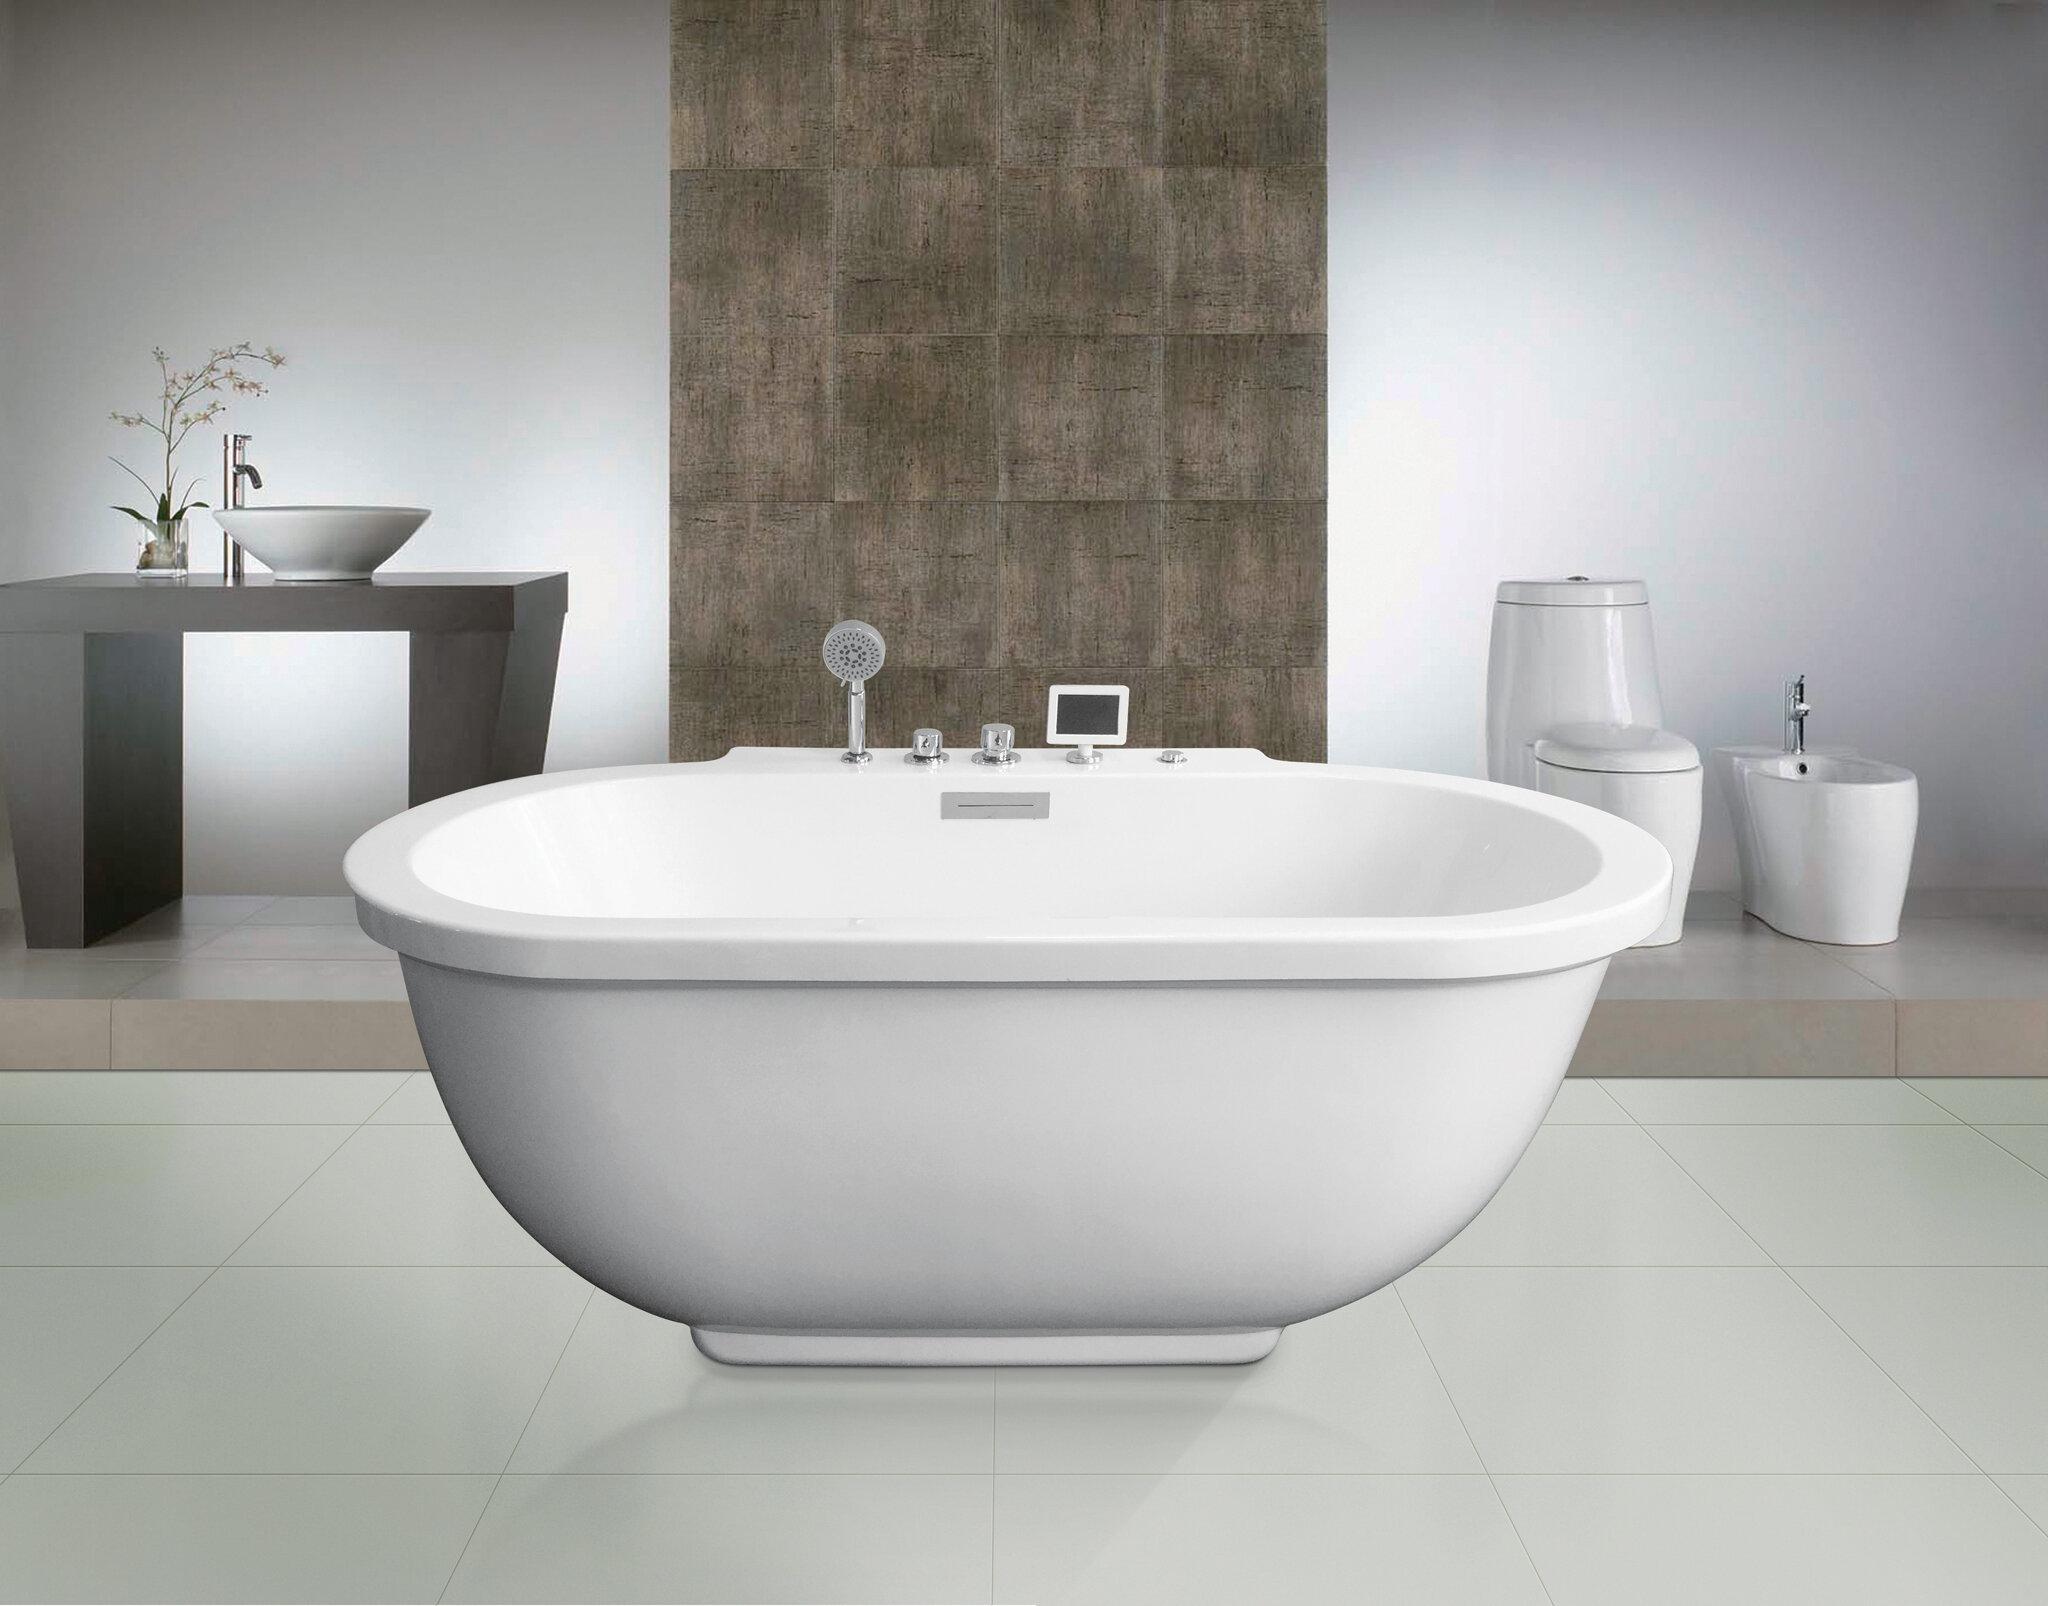 freestanding virtu serenity tub whirlpool usa vtu x soaking